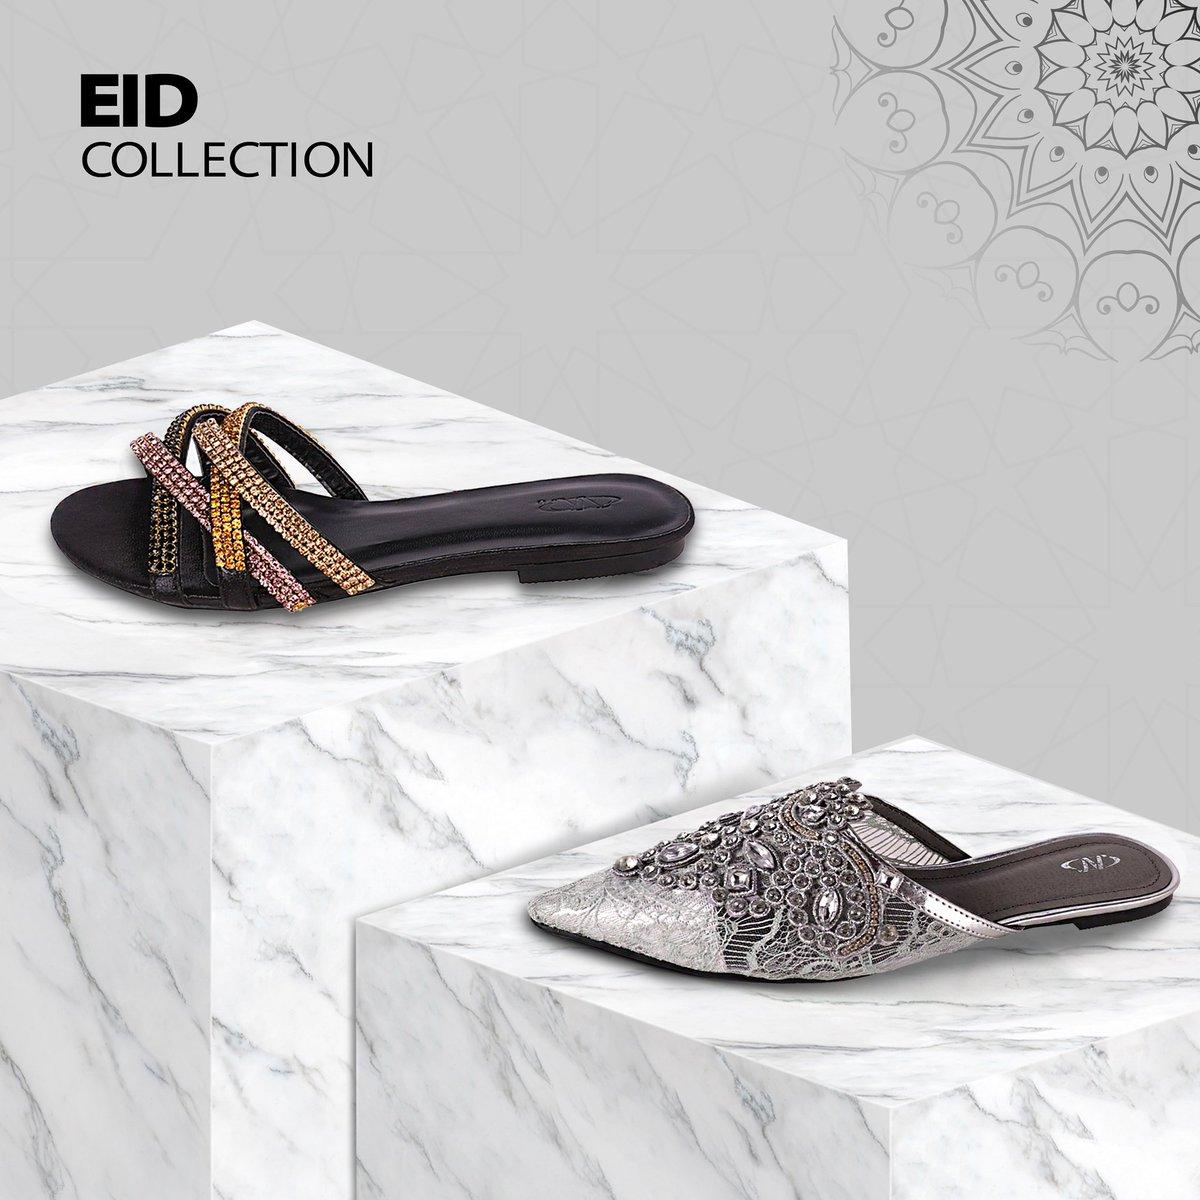 d9a757649 ... #ladies #shoes #Alnasser #الكويت #تشكيلة #العيد #جديدة #أحذية #نسائي  #النصرفاشنpic.twitter.com/bXyqomDDWh